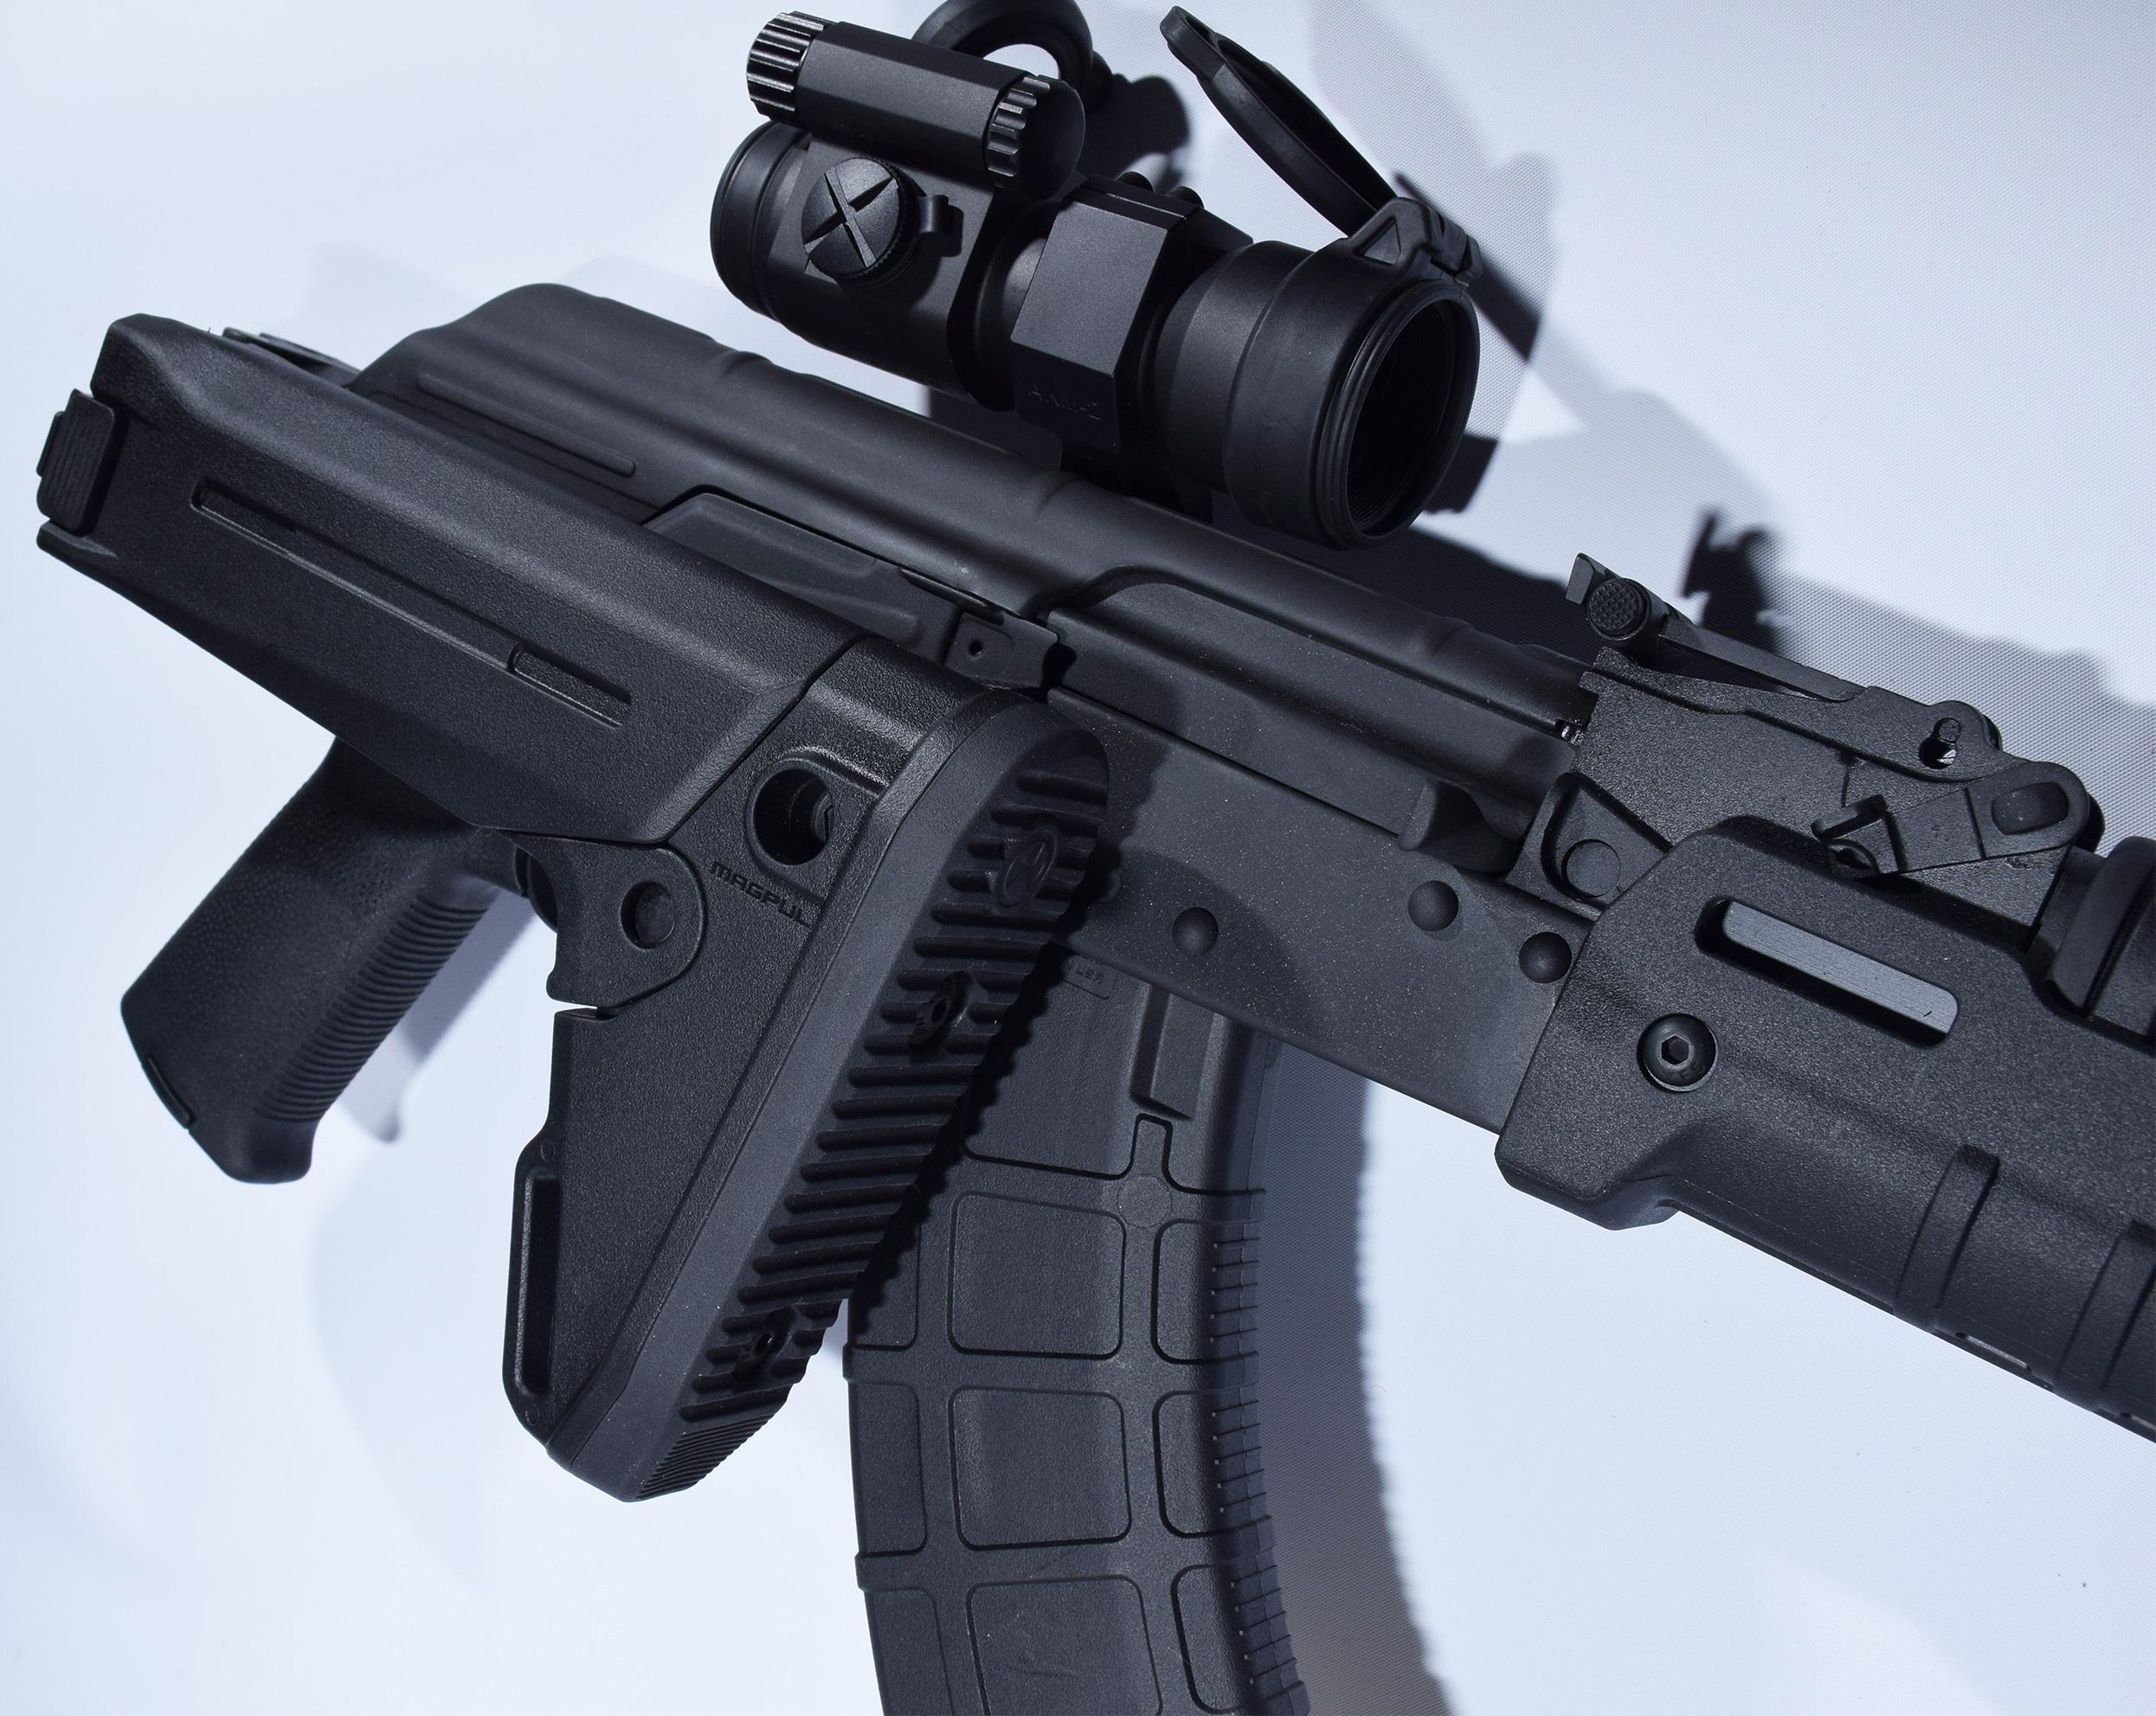 Magpul Zhukov AK-47 Stock Review (with Saiga SGL-21 ...